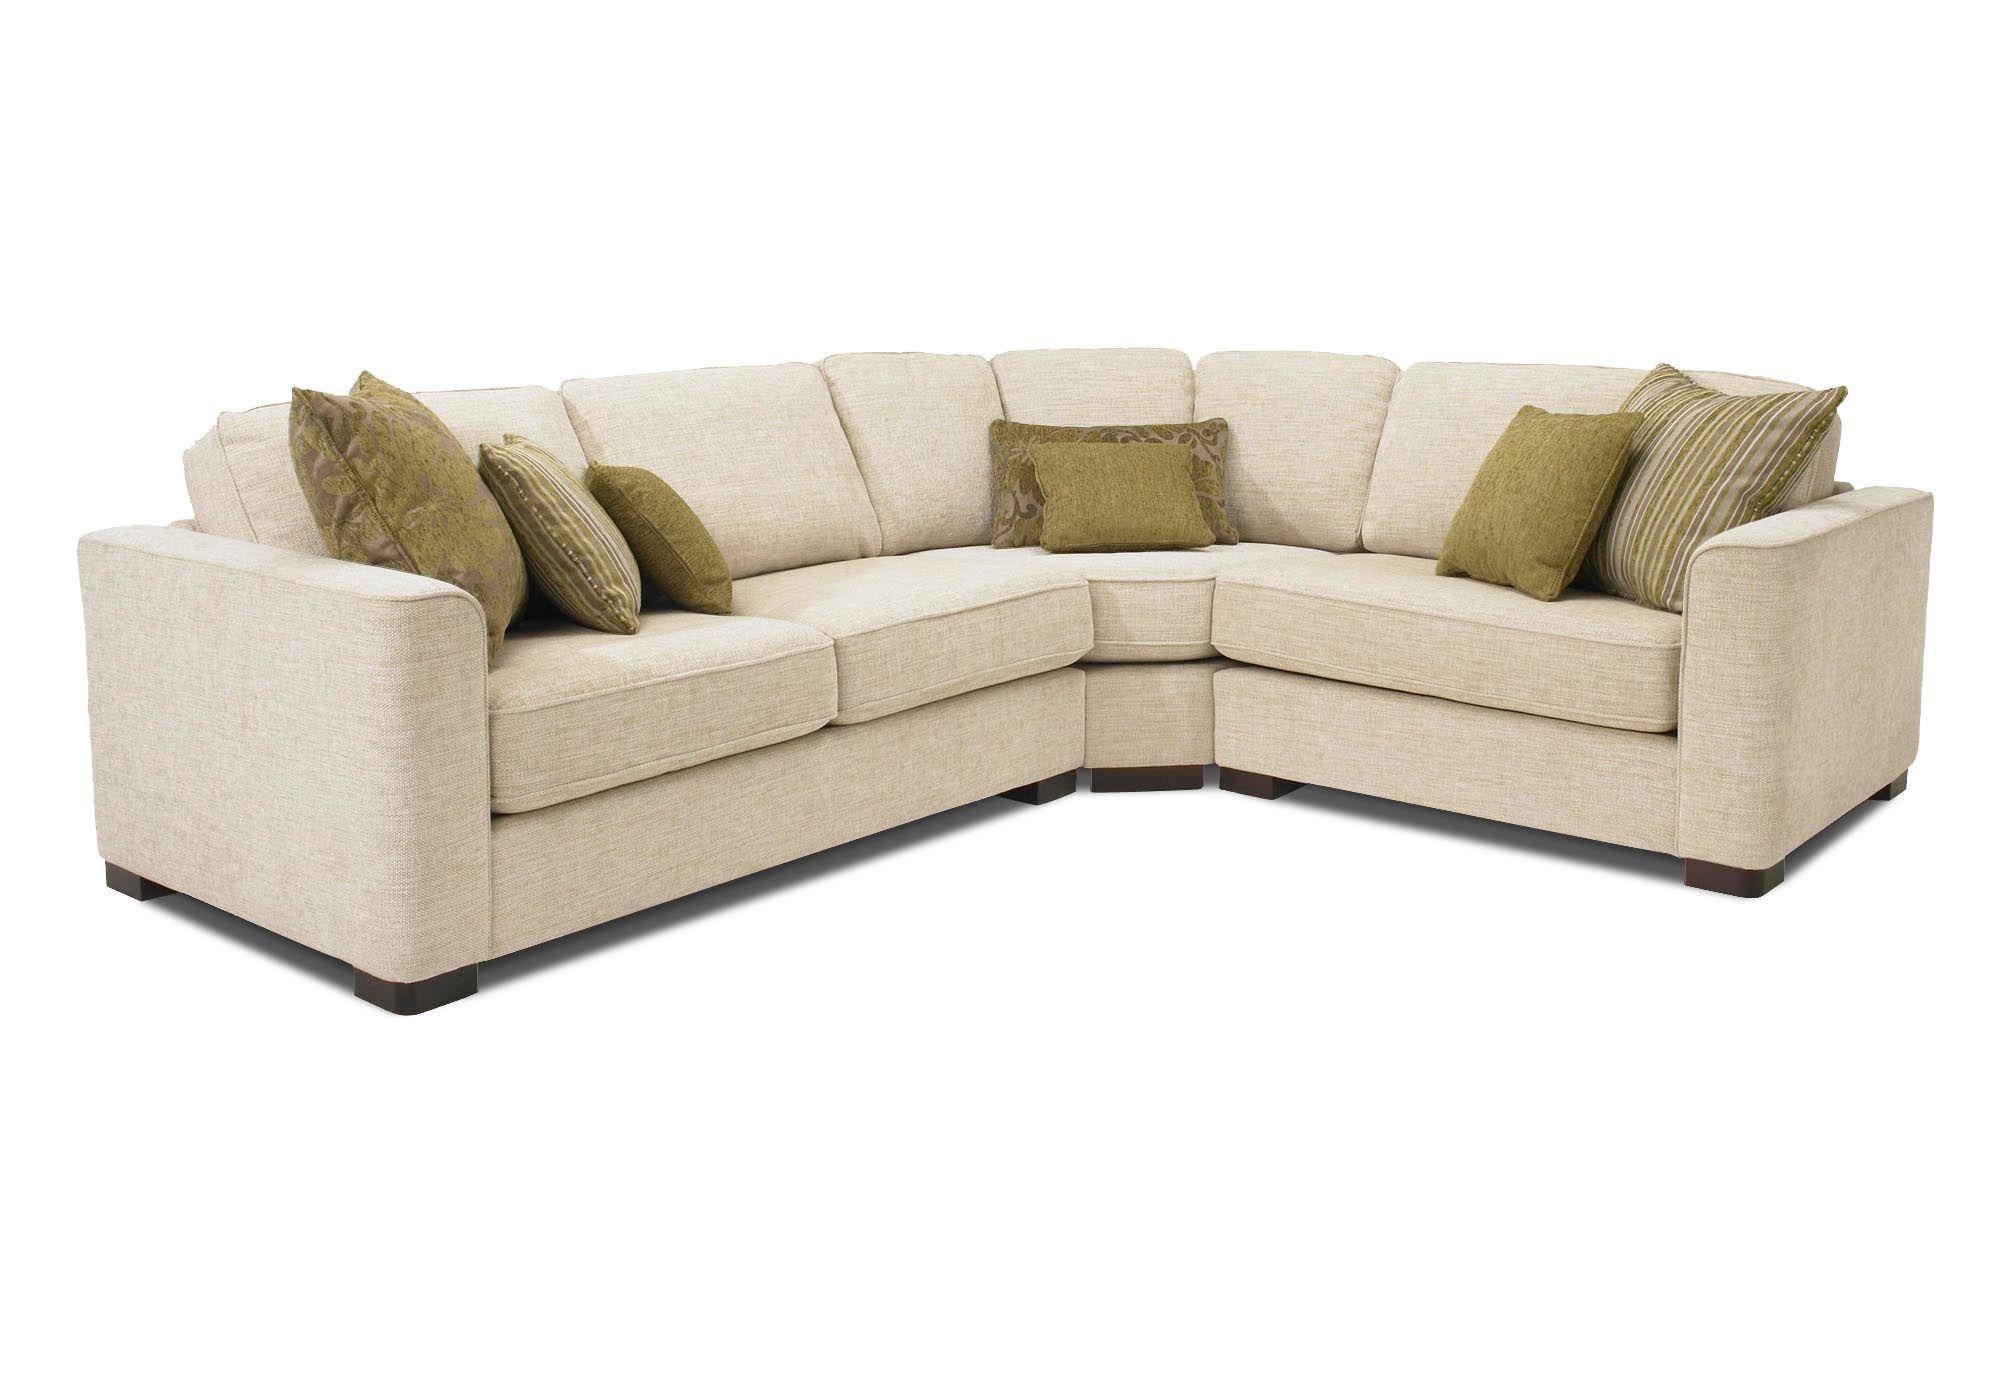 furniture village corner sofa eleanor. Black Bedroom Furniture Sets. Home Design Ideas